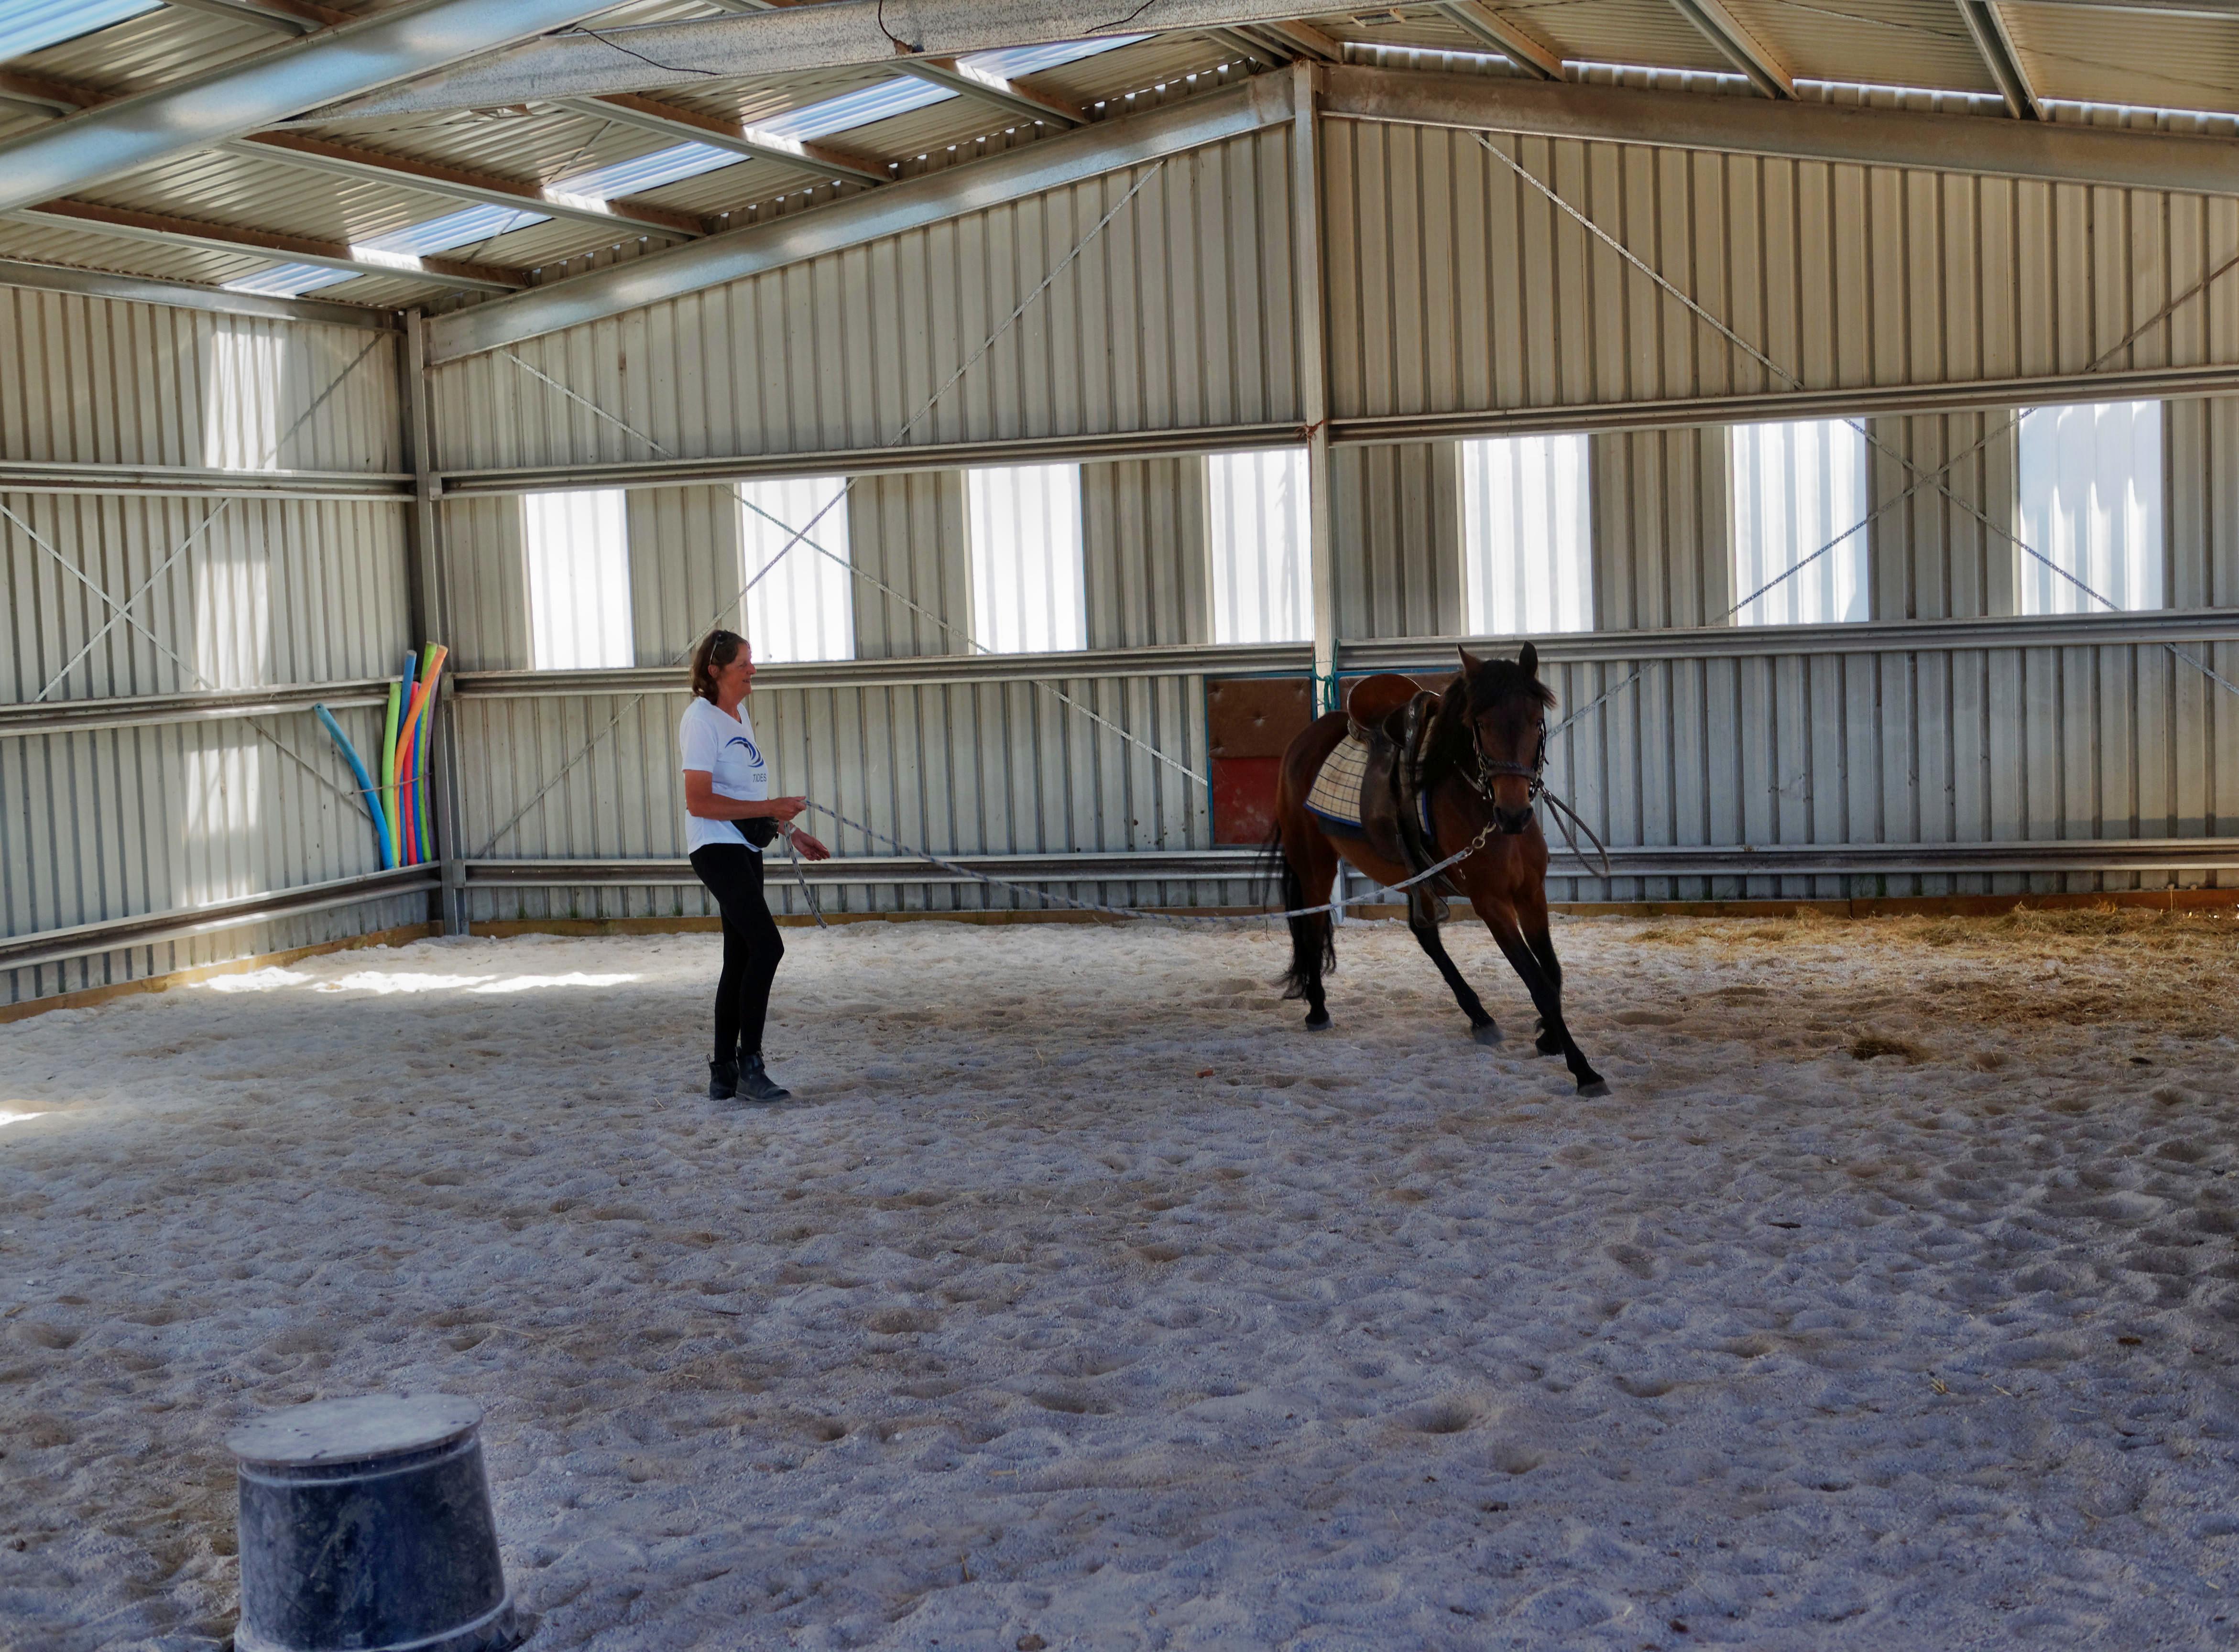 Horses-16.jpeg